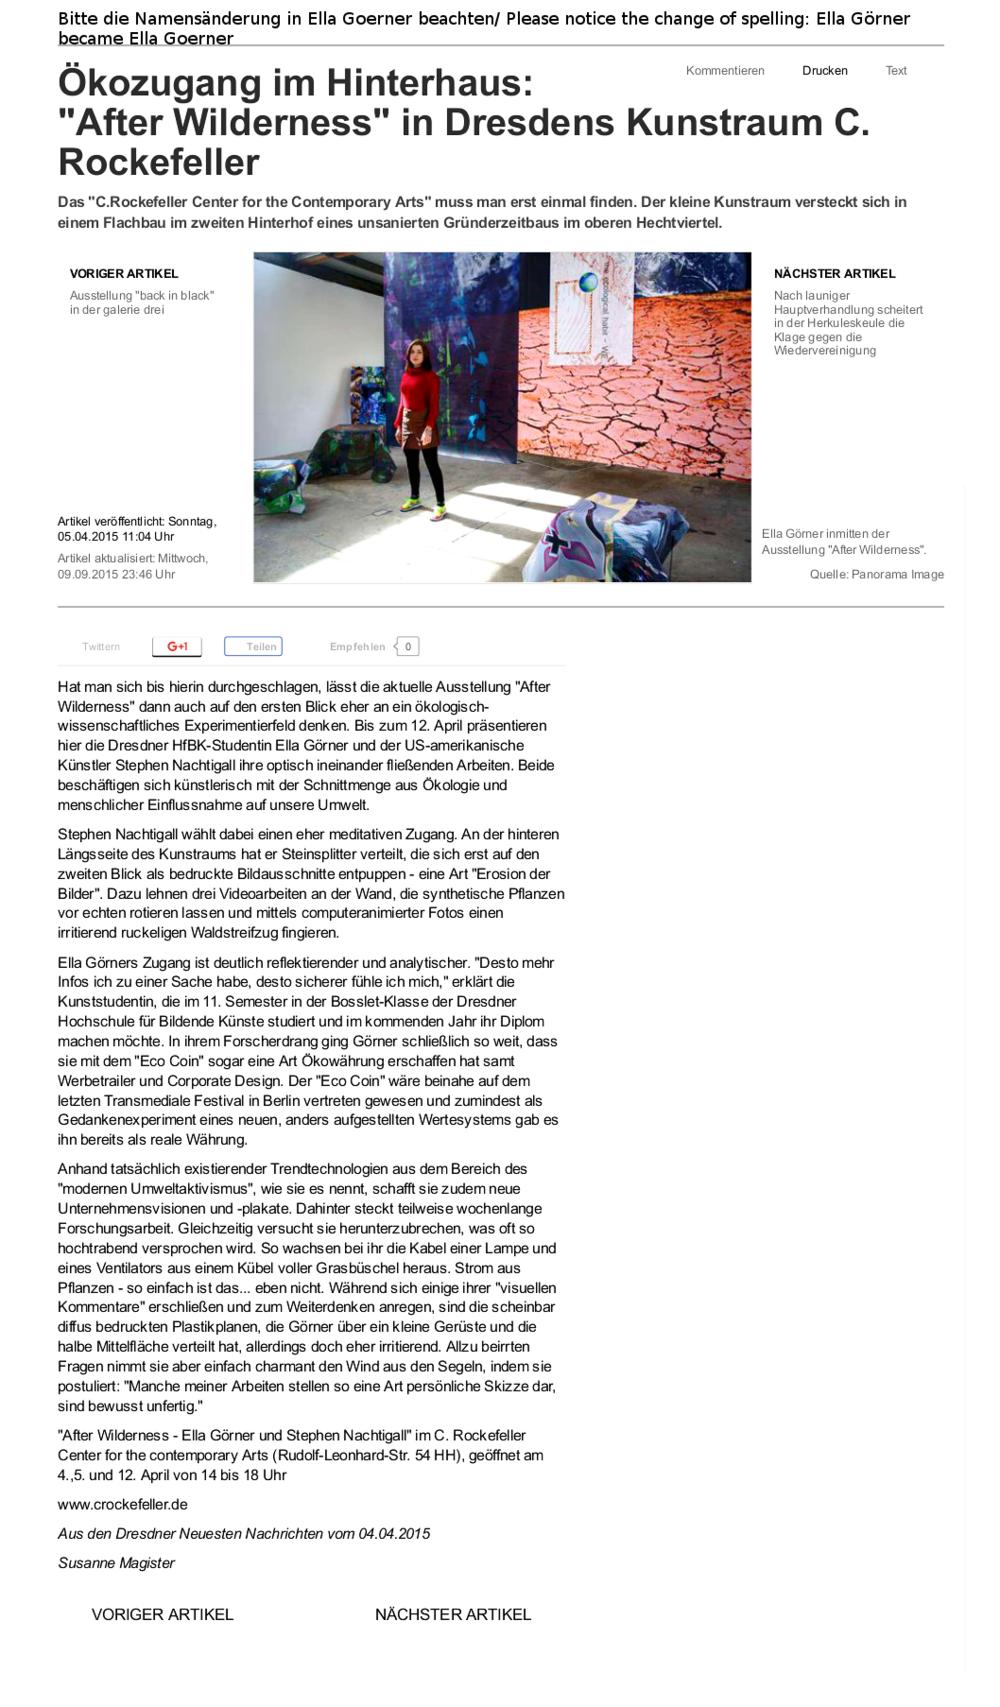 Ella_Goerner_Ökozugang im Hinterhaus-Article_DNN